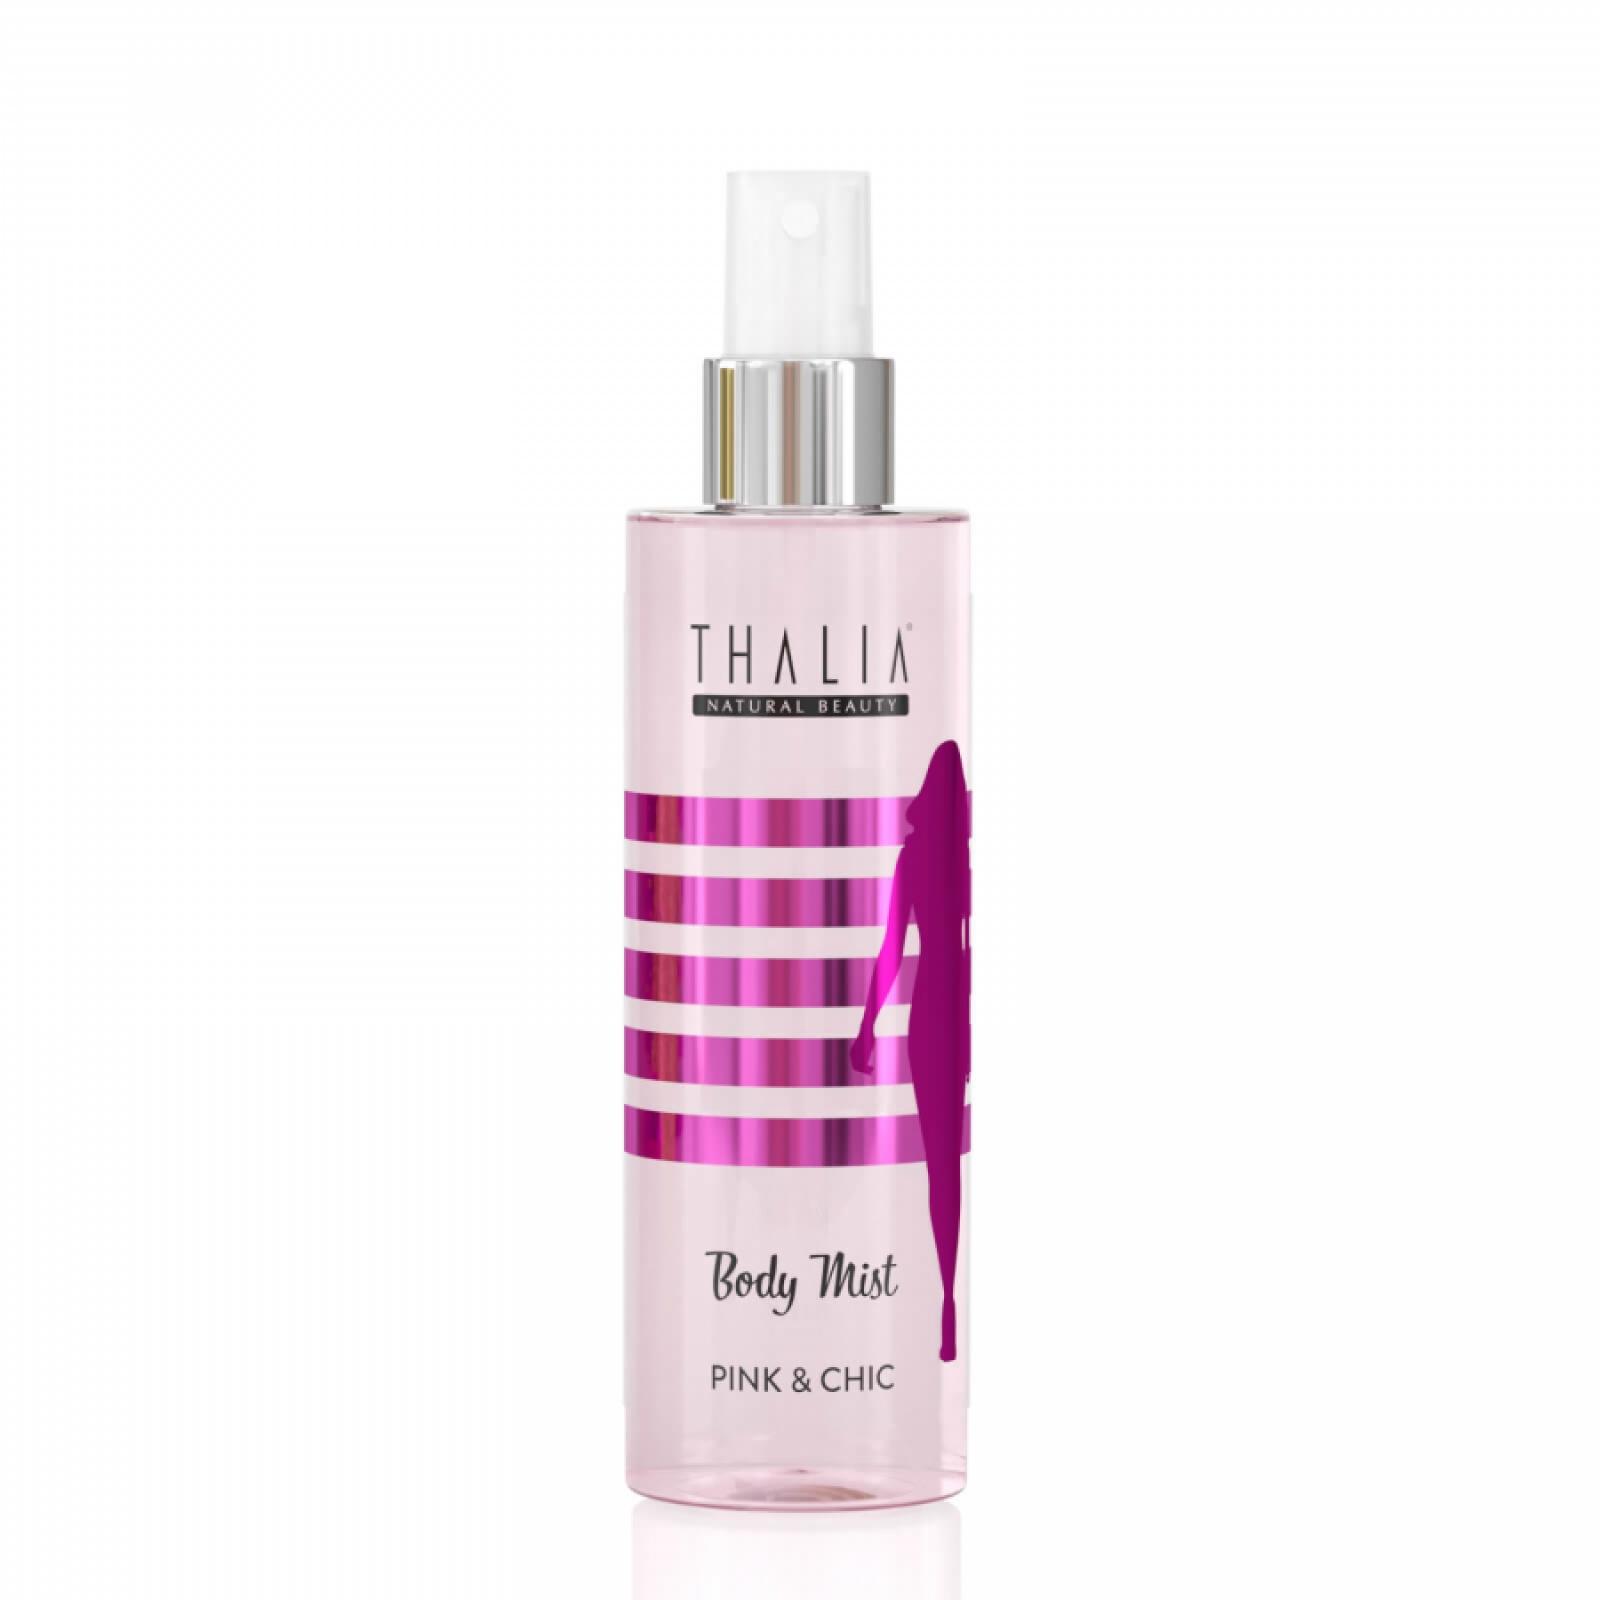 Thalia Pink&Chic Body Mist 200 ml